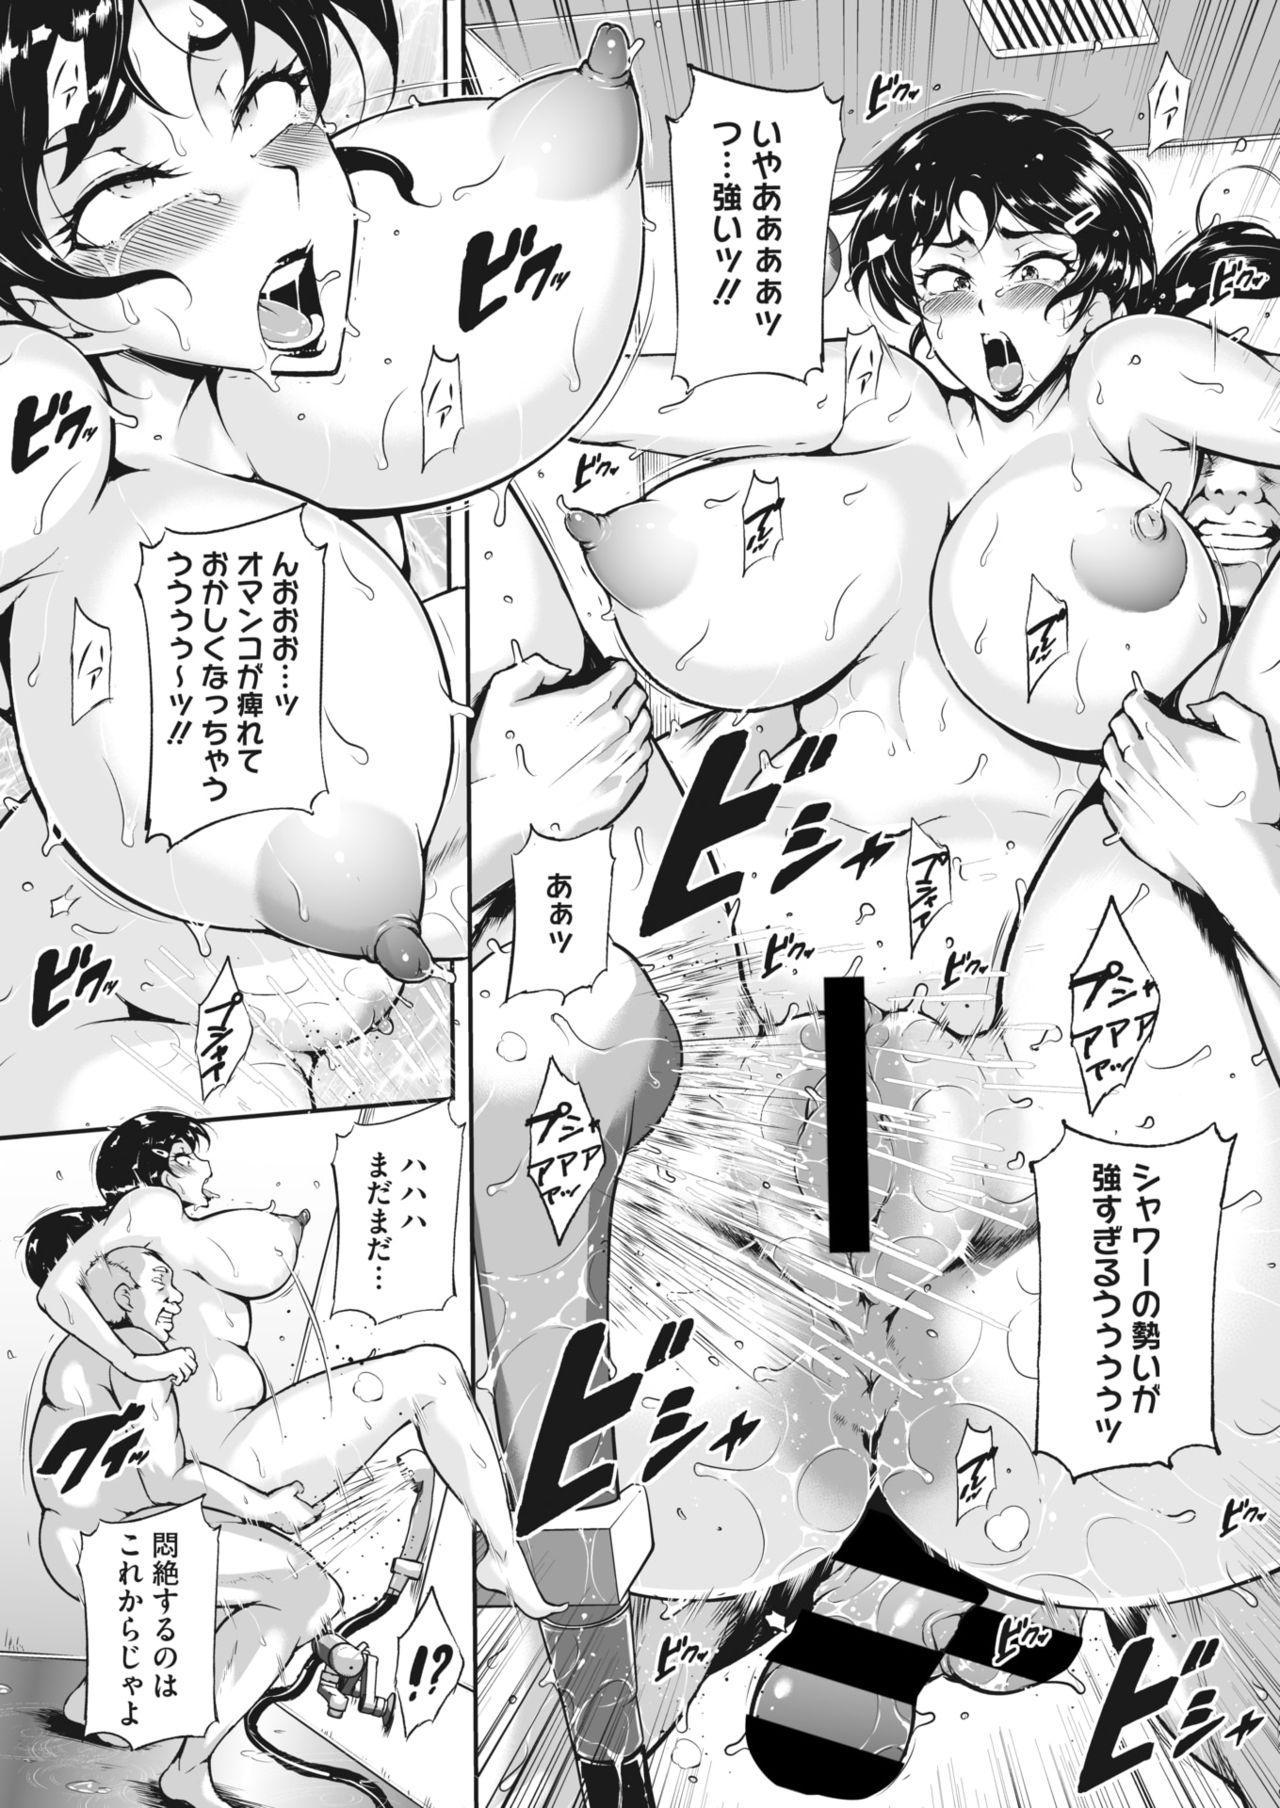 COMIC HOTMiLK Koime Vol. 22 65